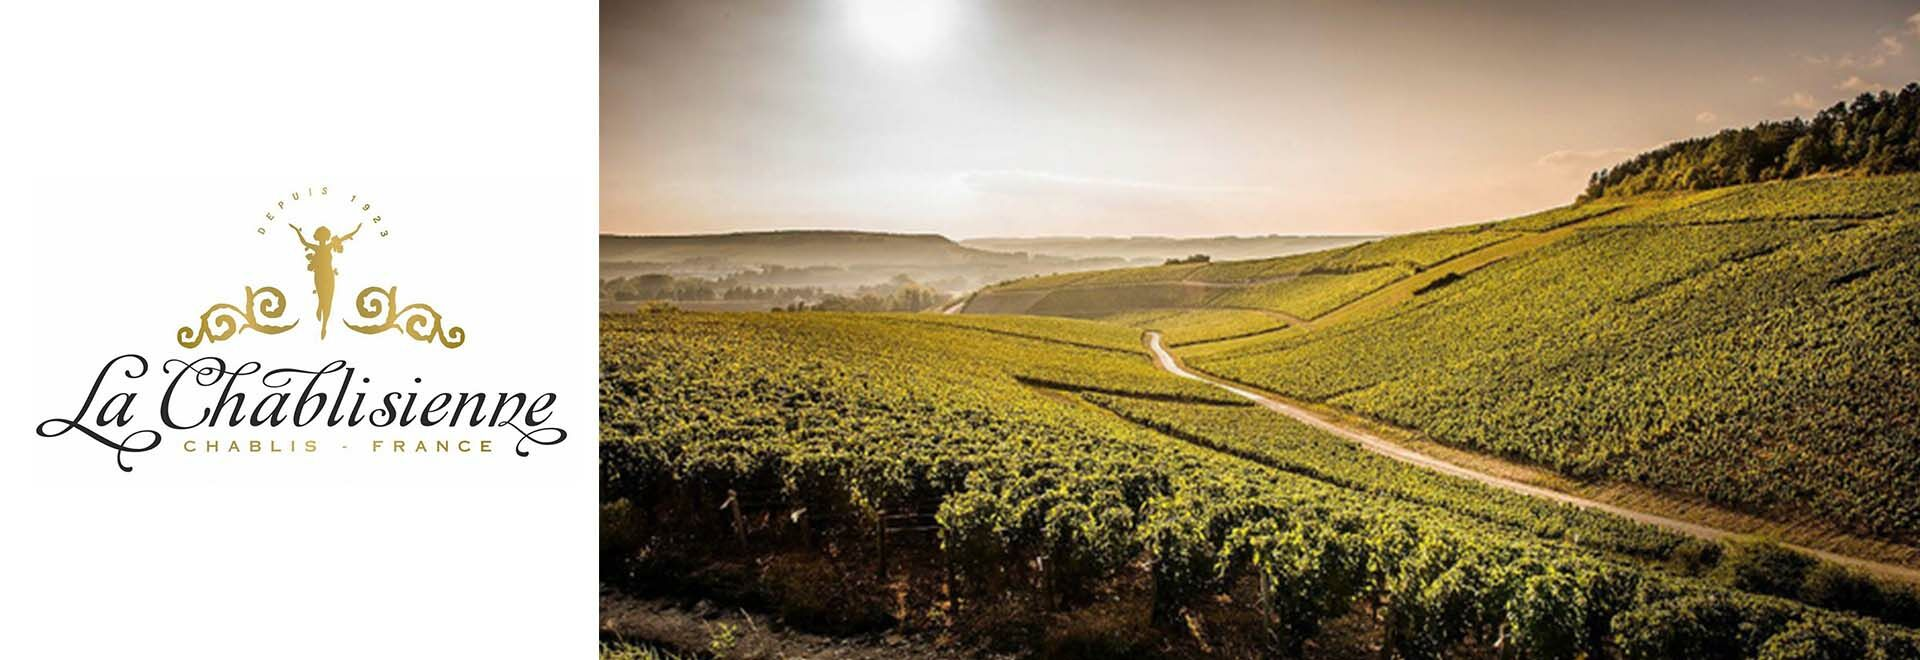 Francia Borok-Chardonnay - Chablis - La Chablisienne Boraszat